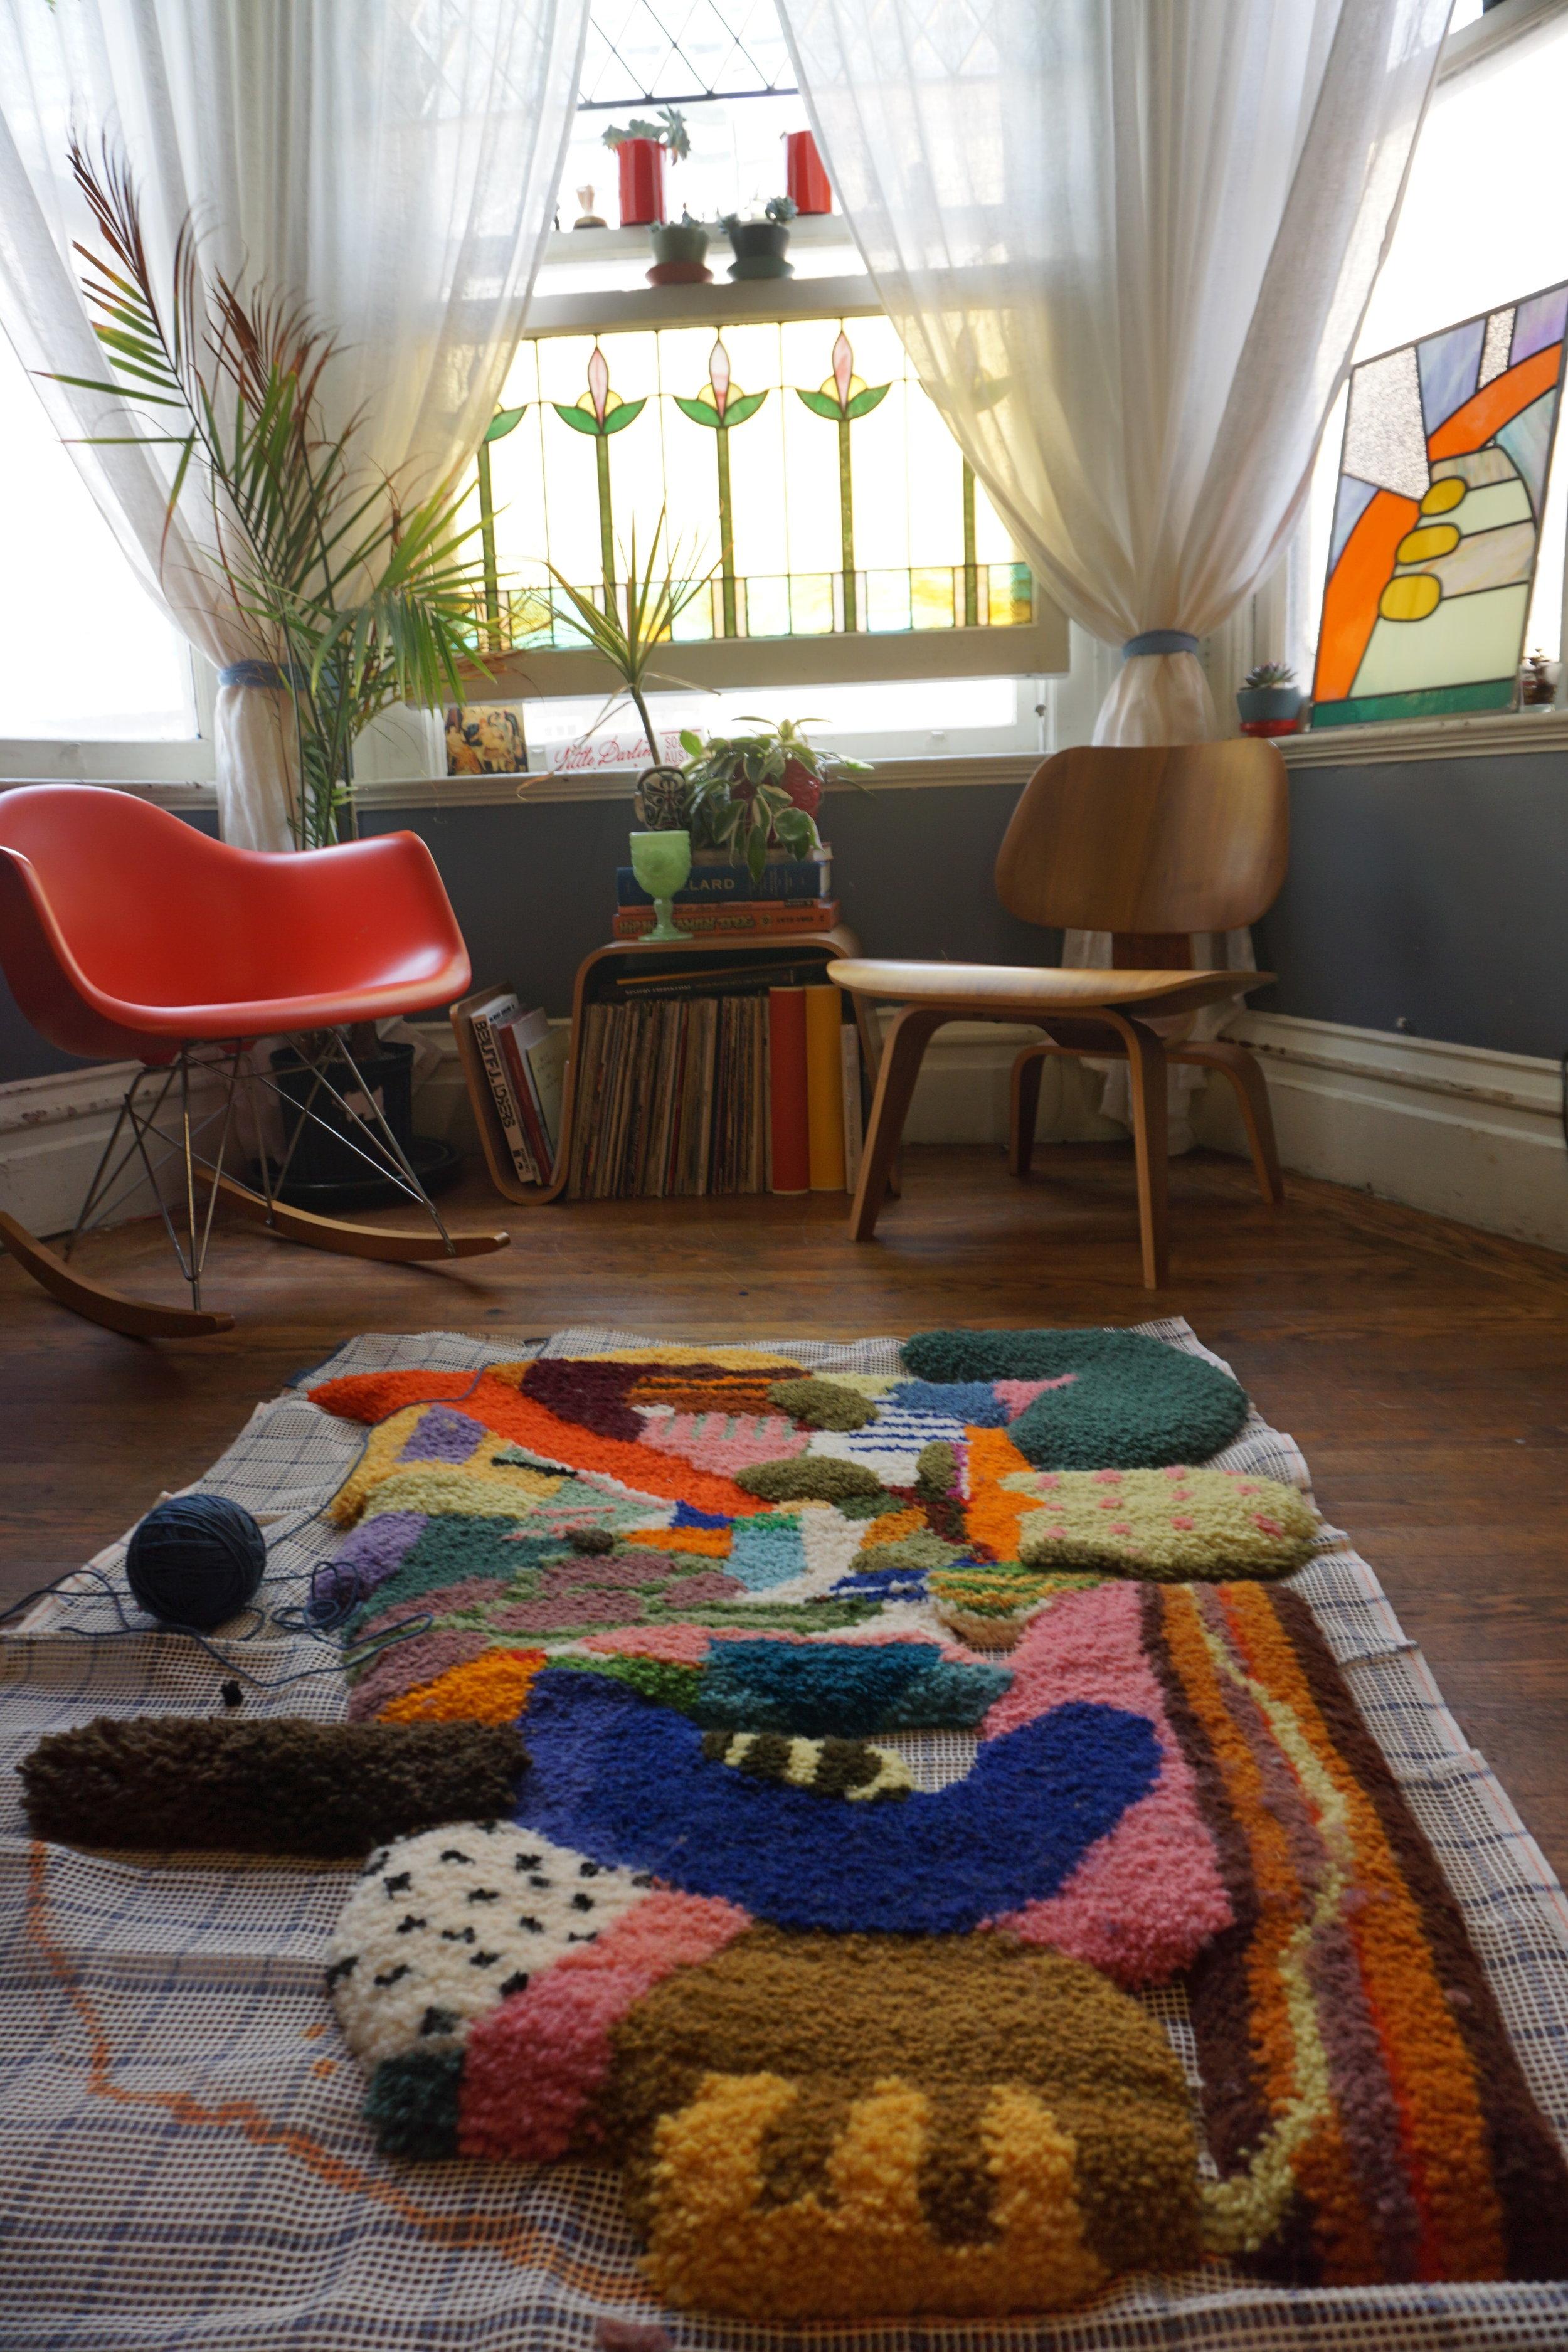 kerbi-urbanowski-home-WIP-rug-stained-glass.JPG